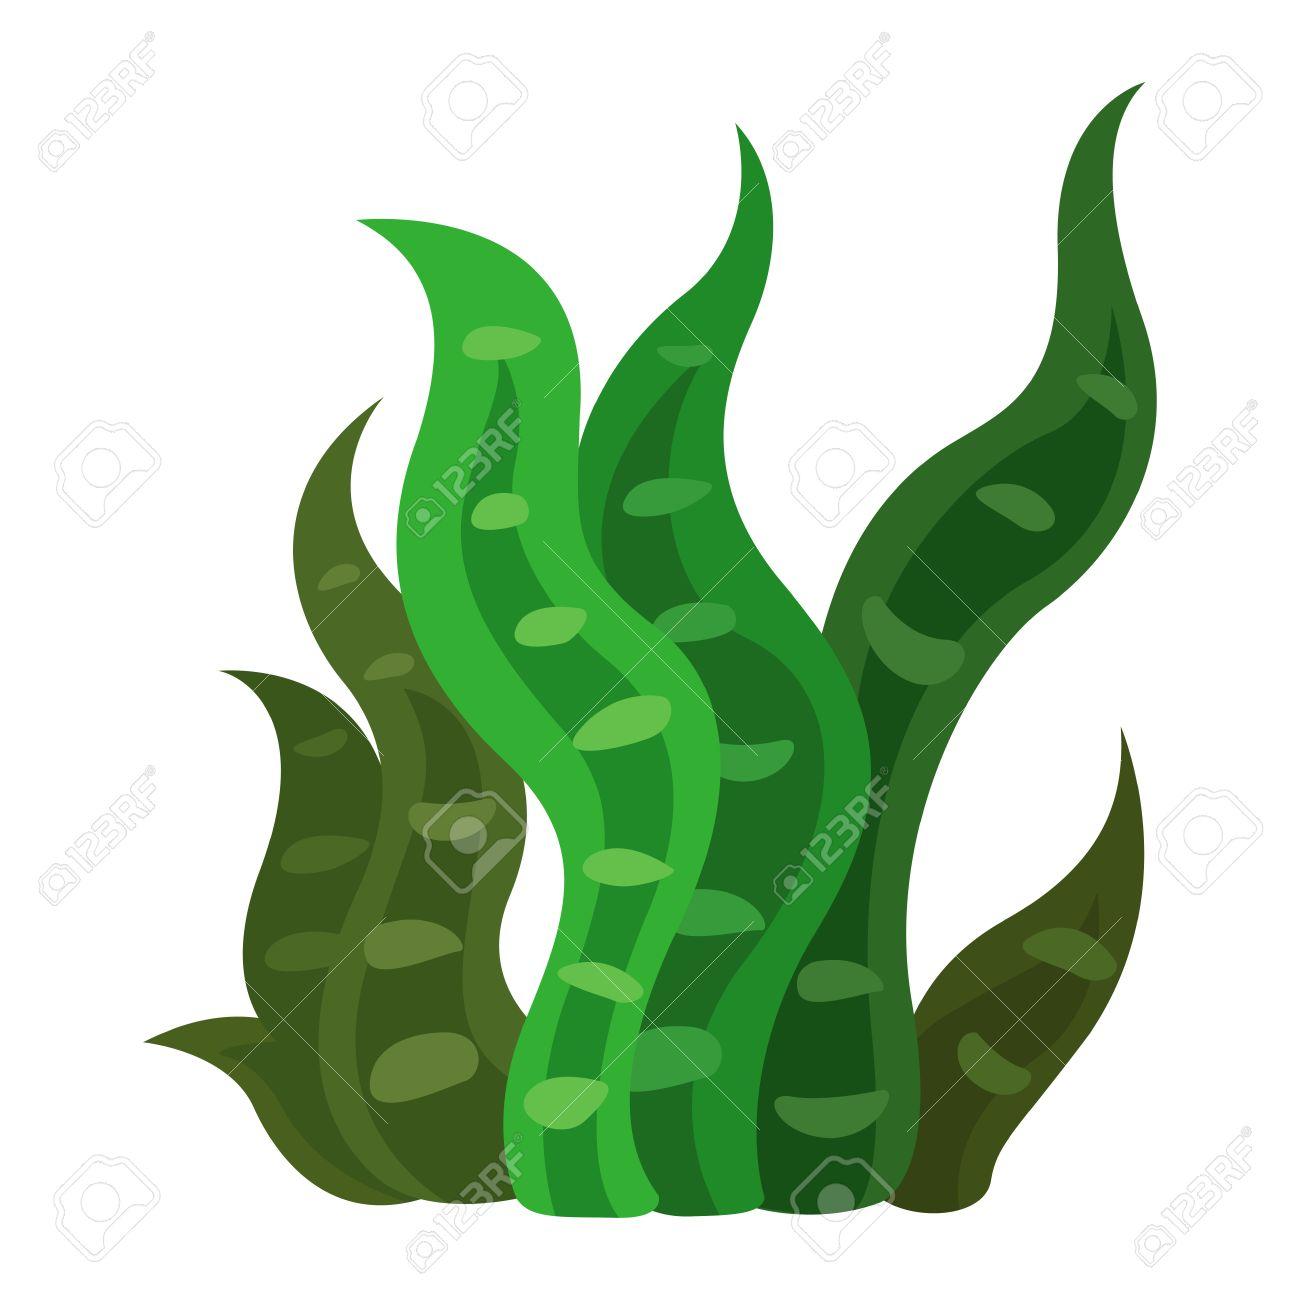 illustration of a seaweed vector royalty free cliparts vectors and rh 123rf com seaweed vector images seaweed vector images